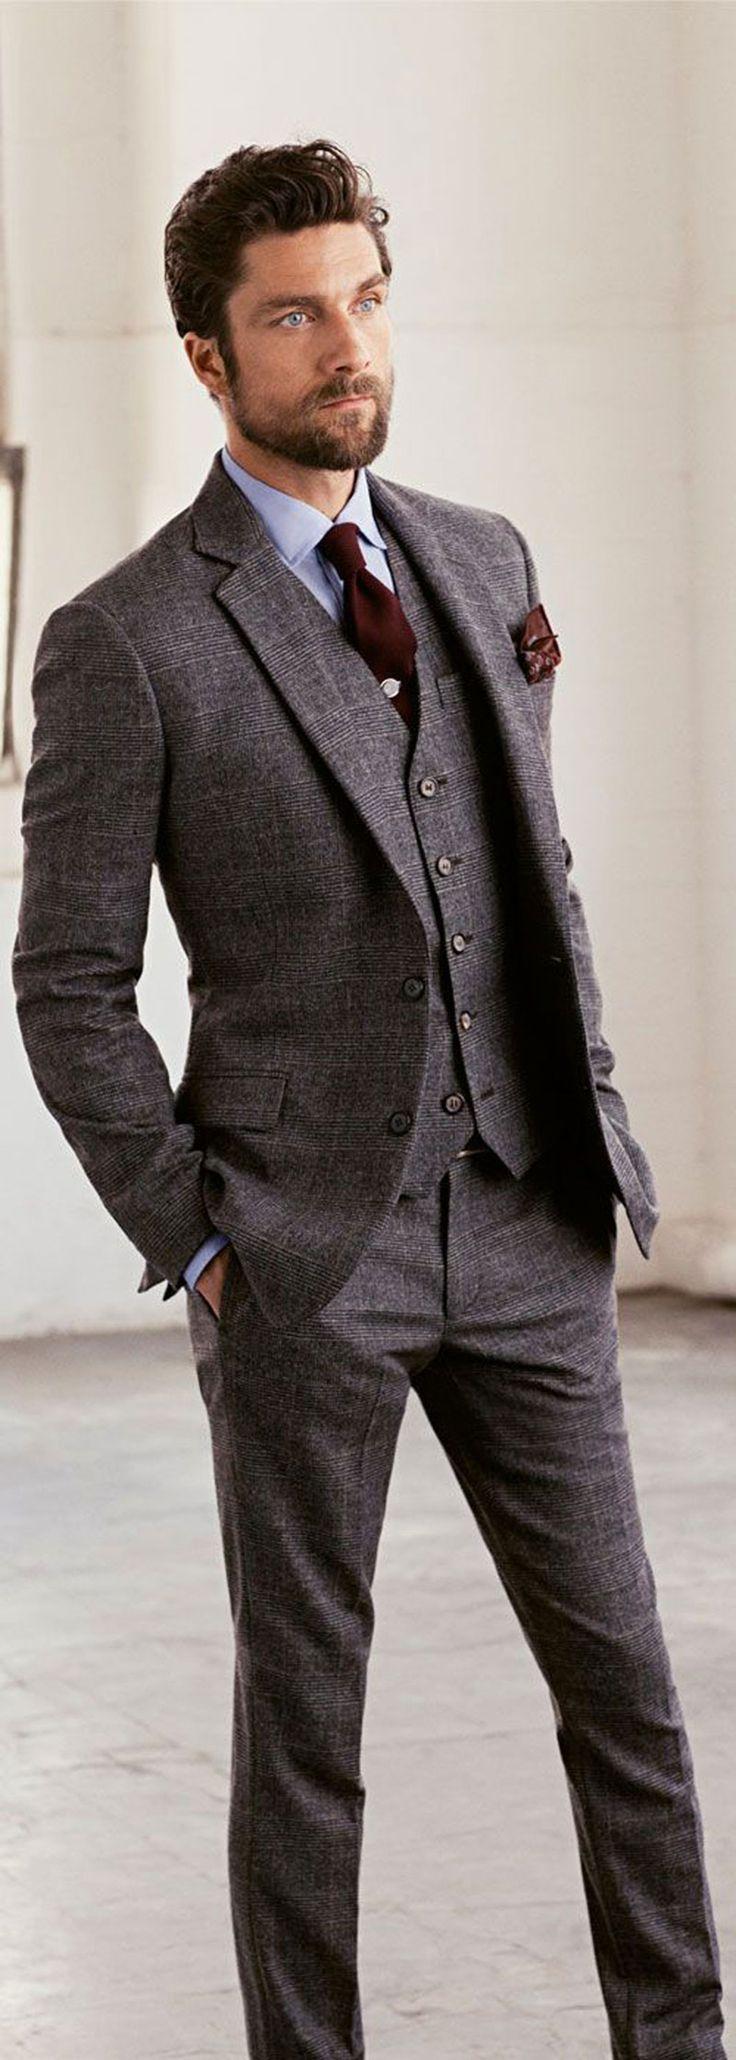 Grey Suit // fall wedding, groom, groomsmen, wedding party   Grey ...